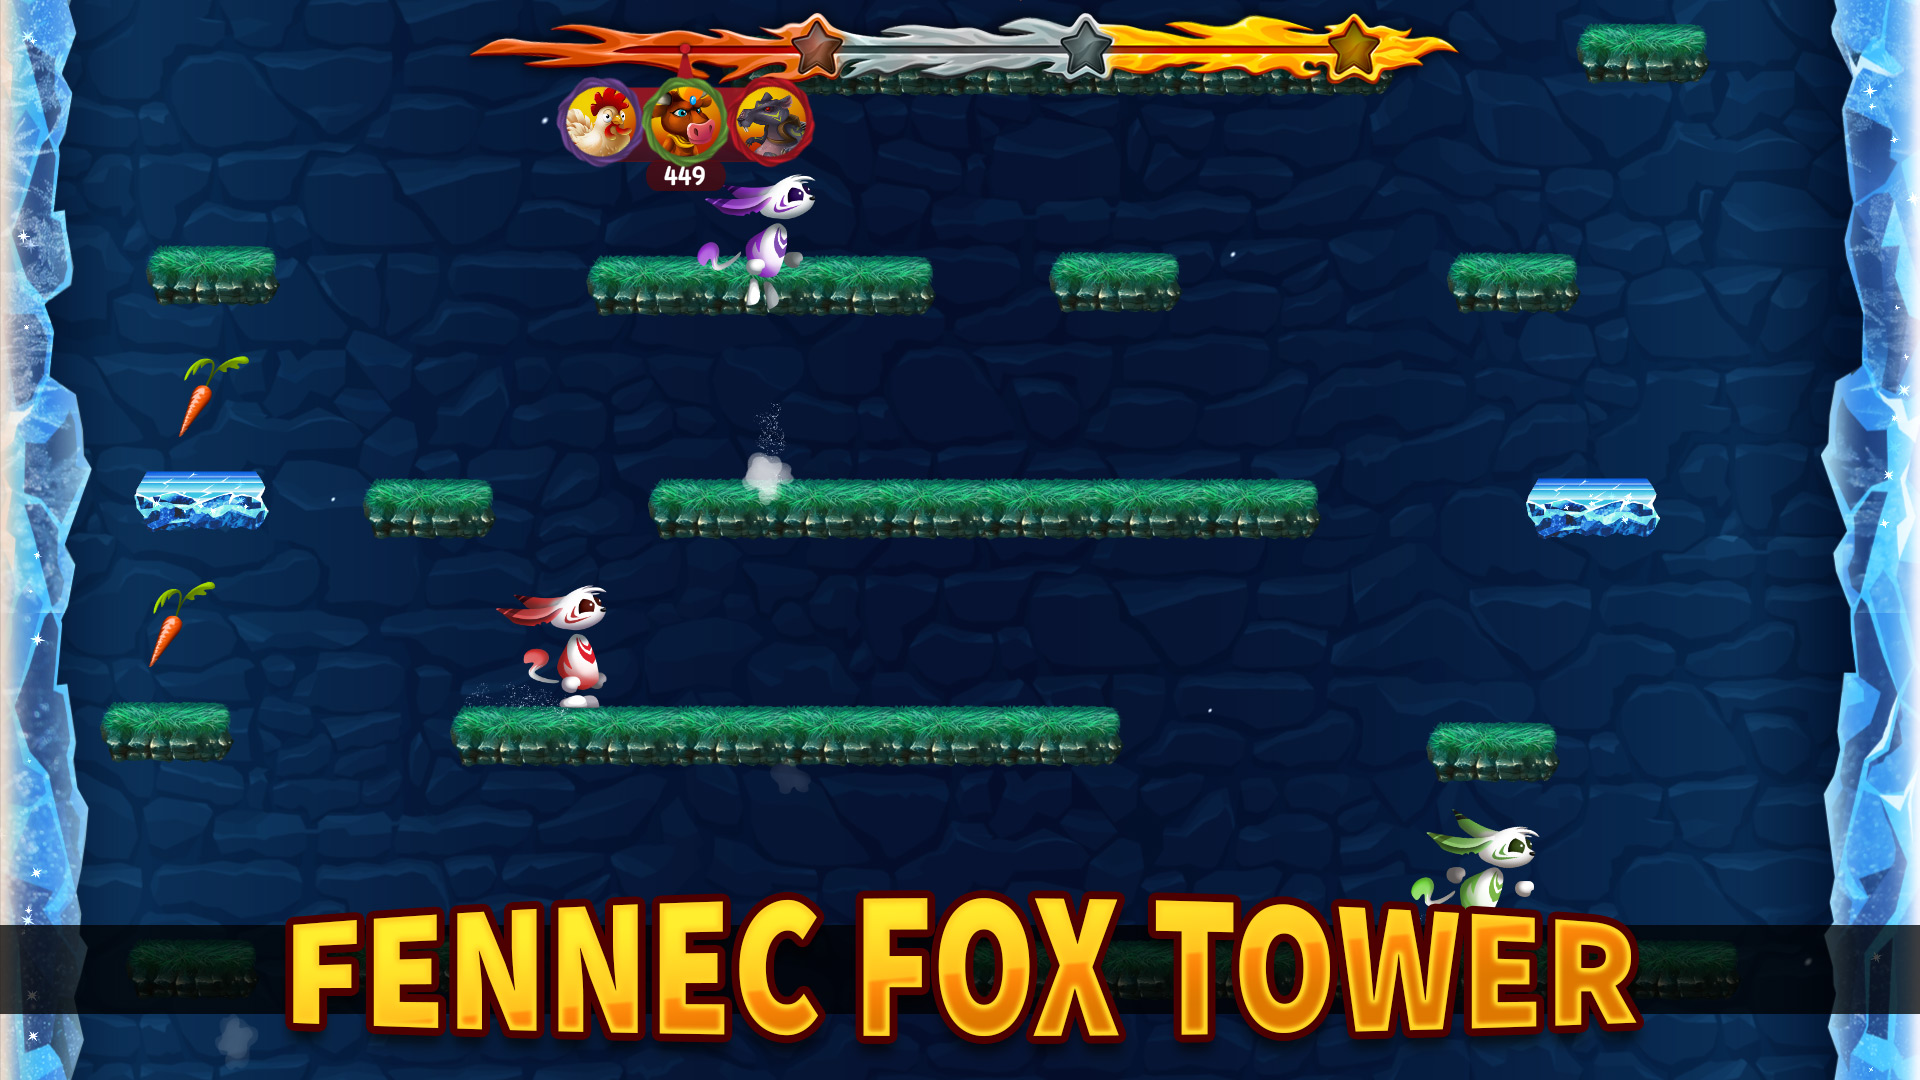 PP_FENNEC_FOX_TOWER